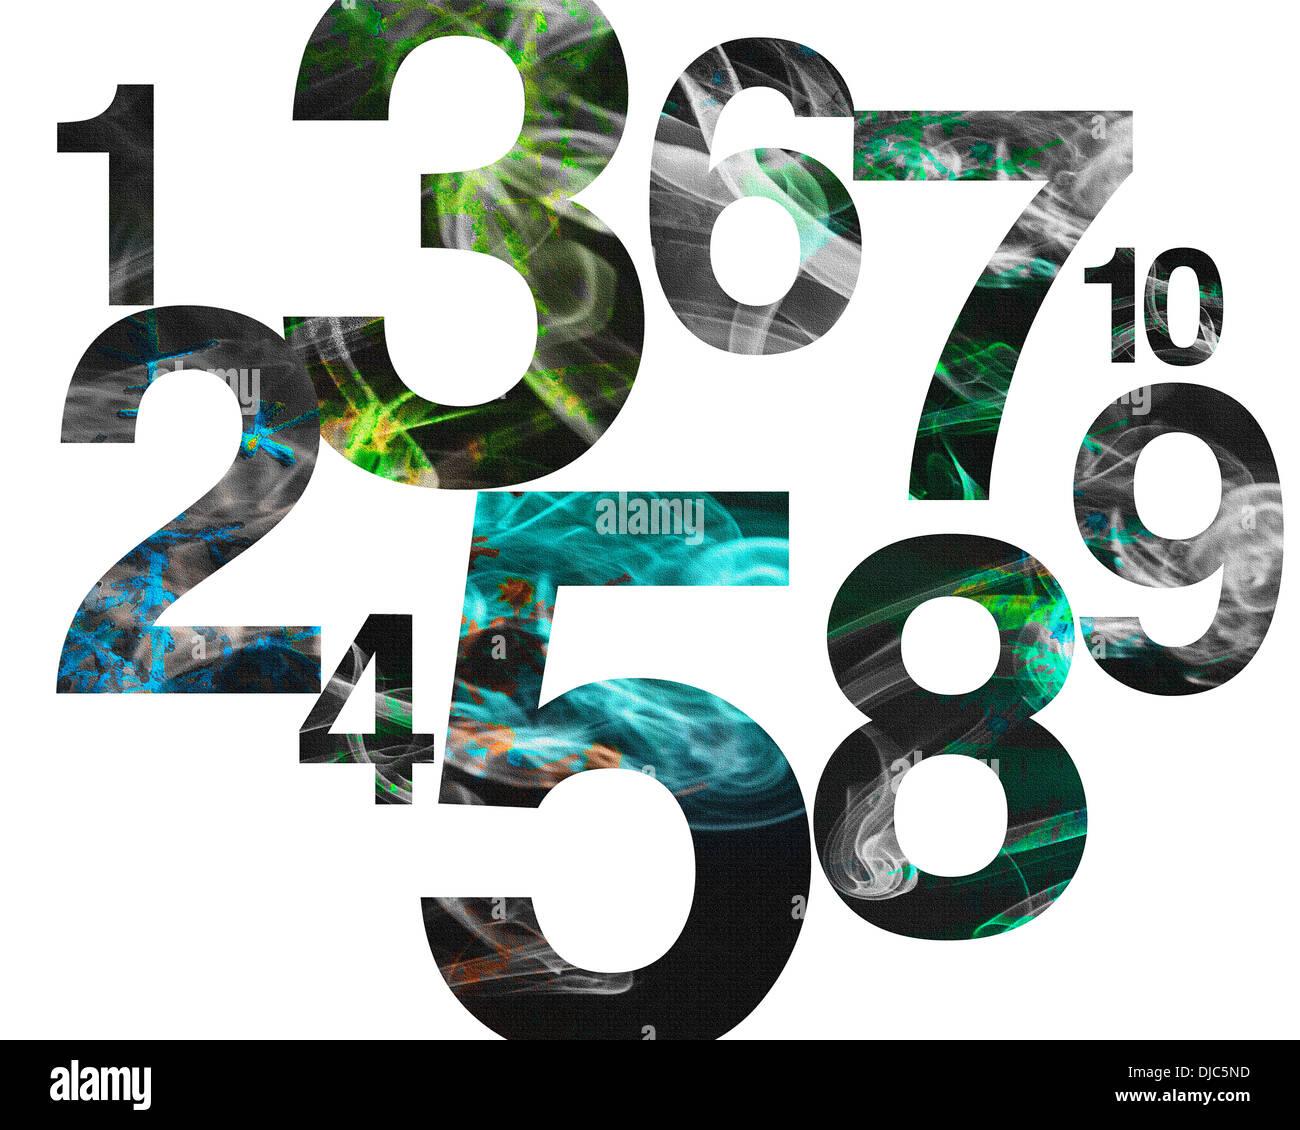 Diseño gráfico: NUMB3RS Imagen De Stock